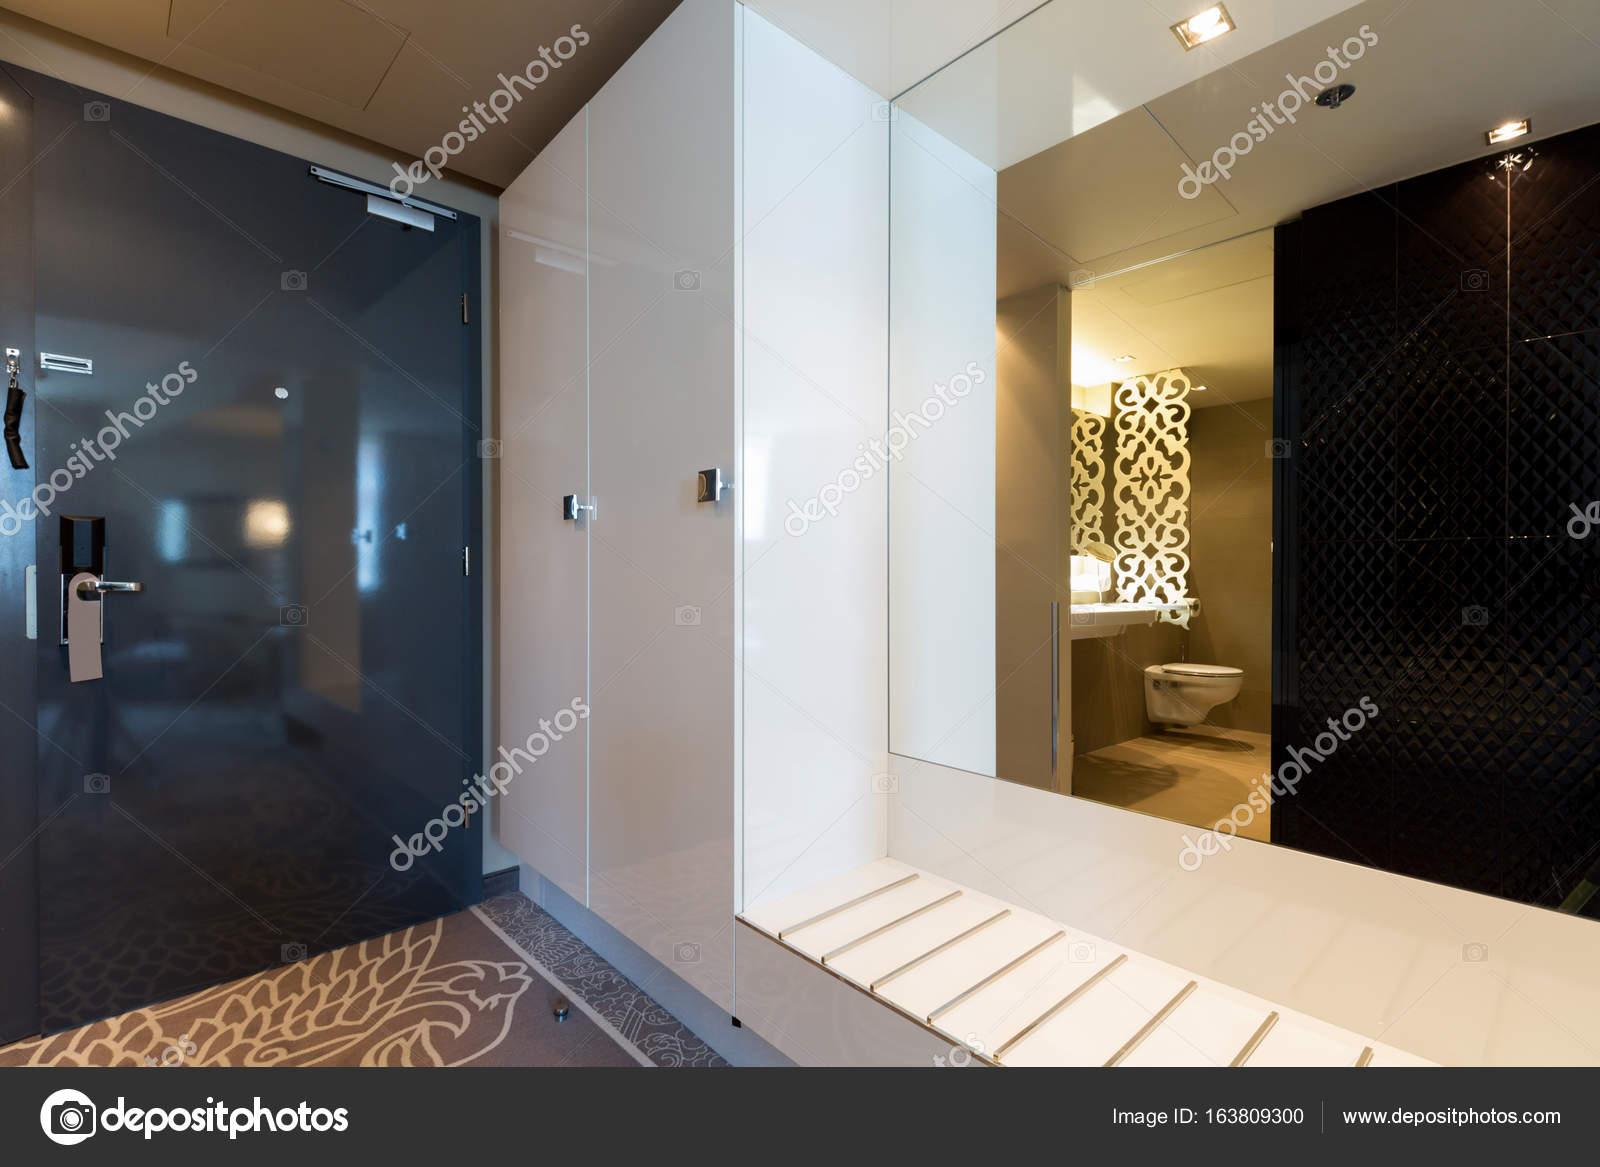 Decoratie Interieur Corridor : Hotel kamer ingang corridor u stockfoto rilueda